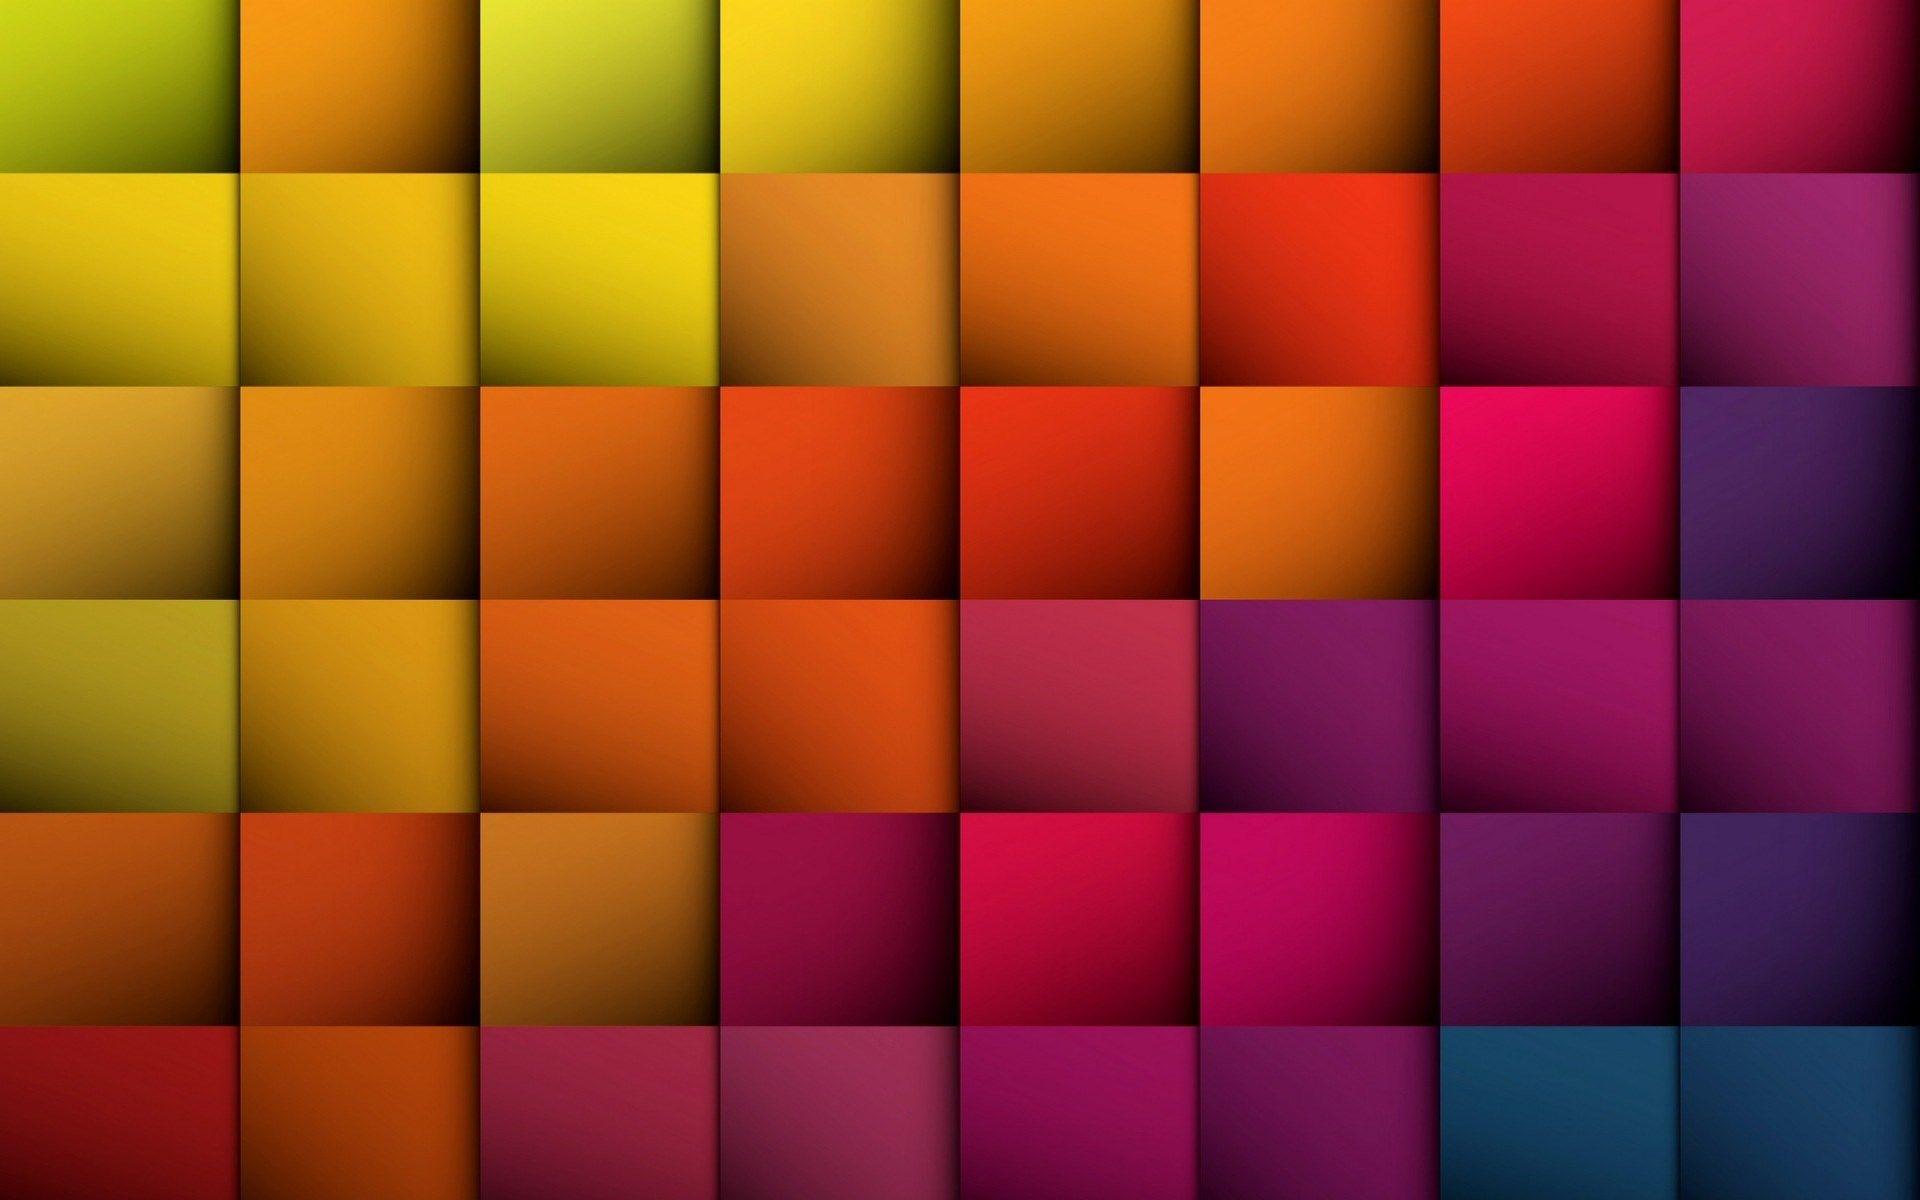 3d Color Checks Walls Hd Wallpapers Qhd Wallpaper Color Splash Background Square Background